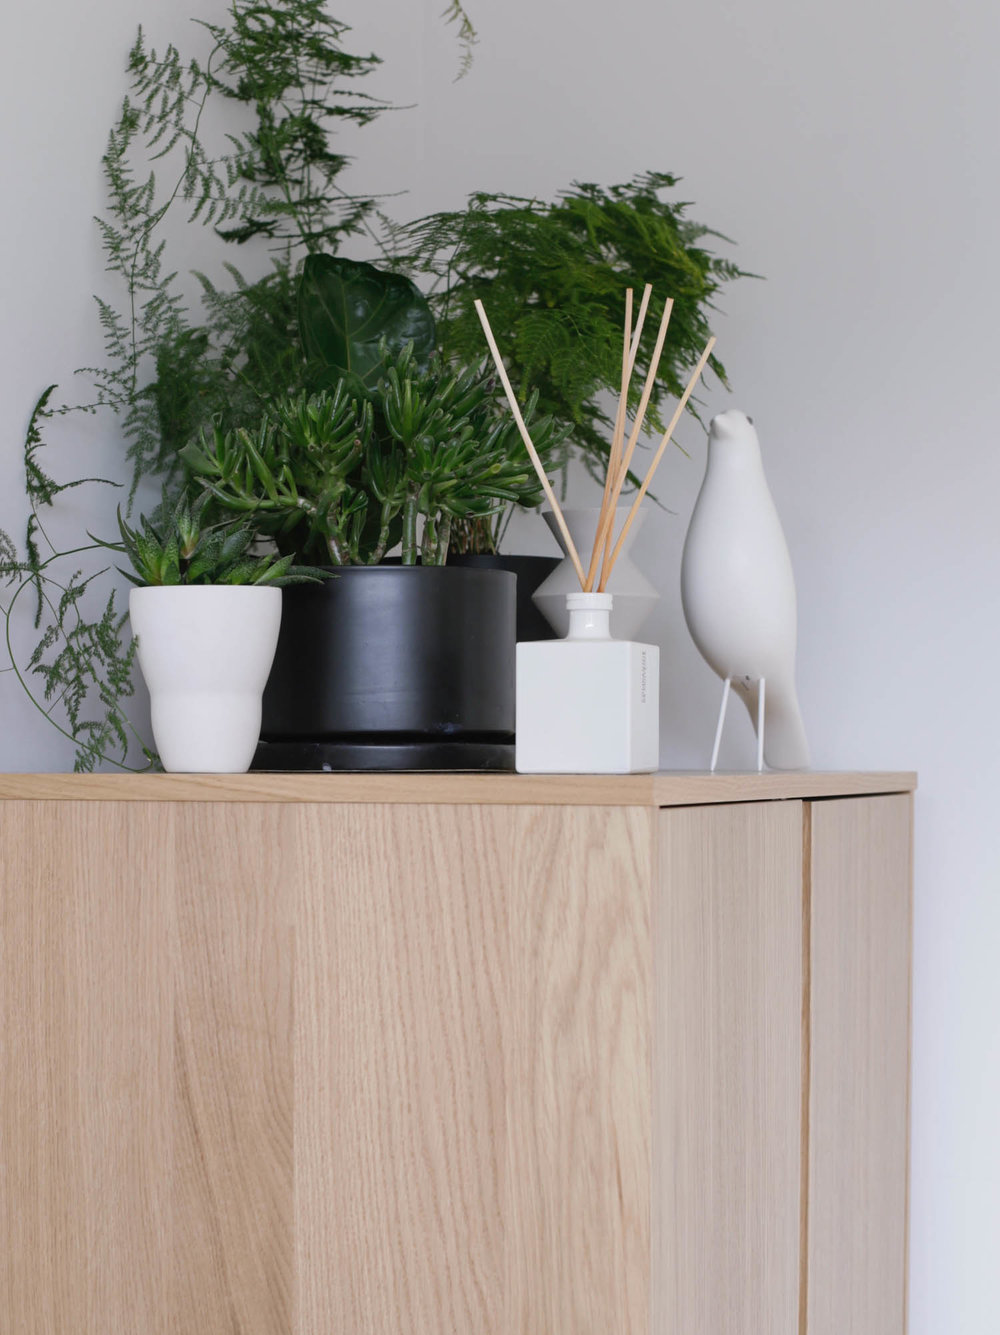 Houseplants and white Vitra house bird